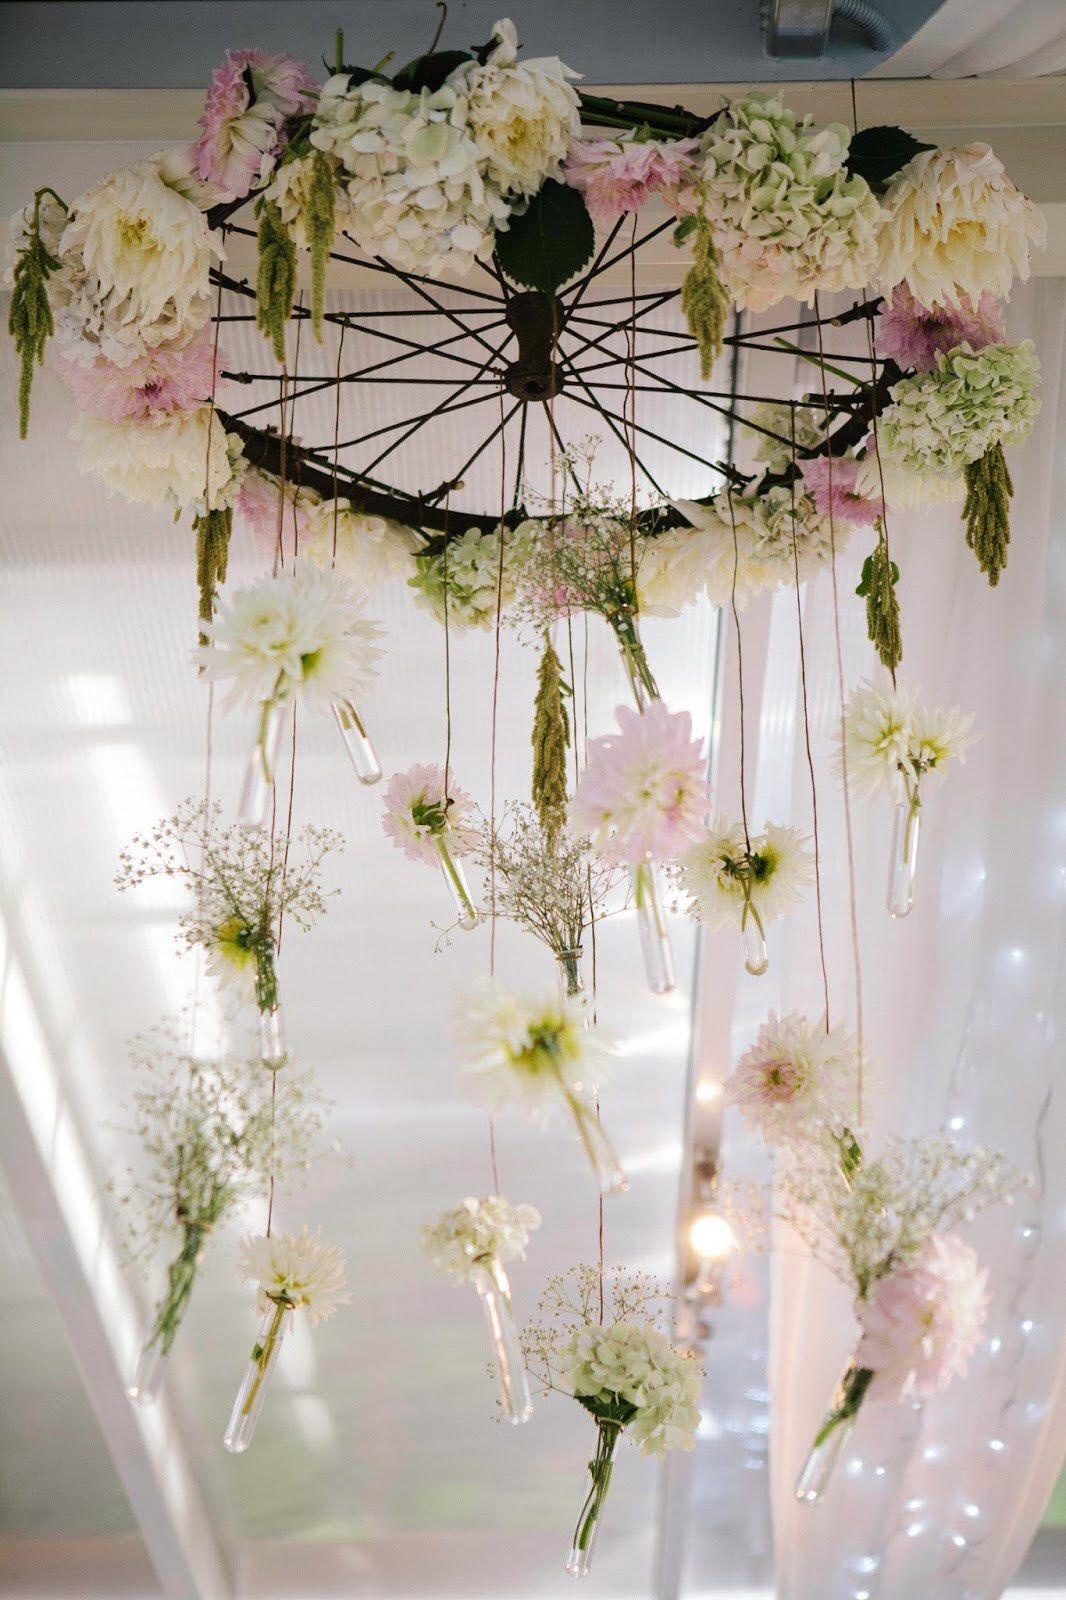 Bicycle Wheel Flower Chandelier Decoration Ideas Pinterest